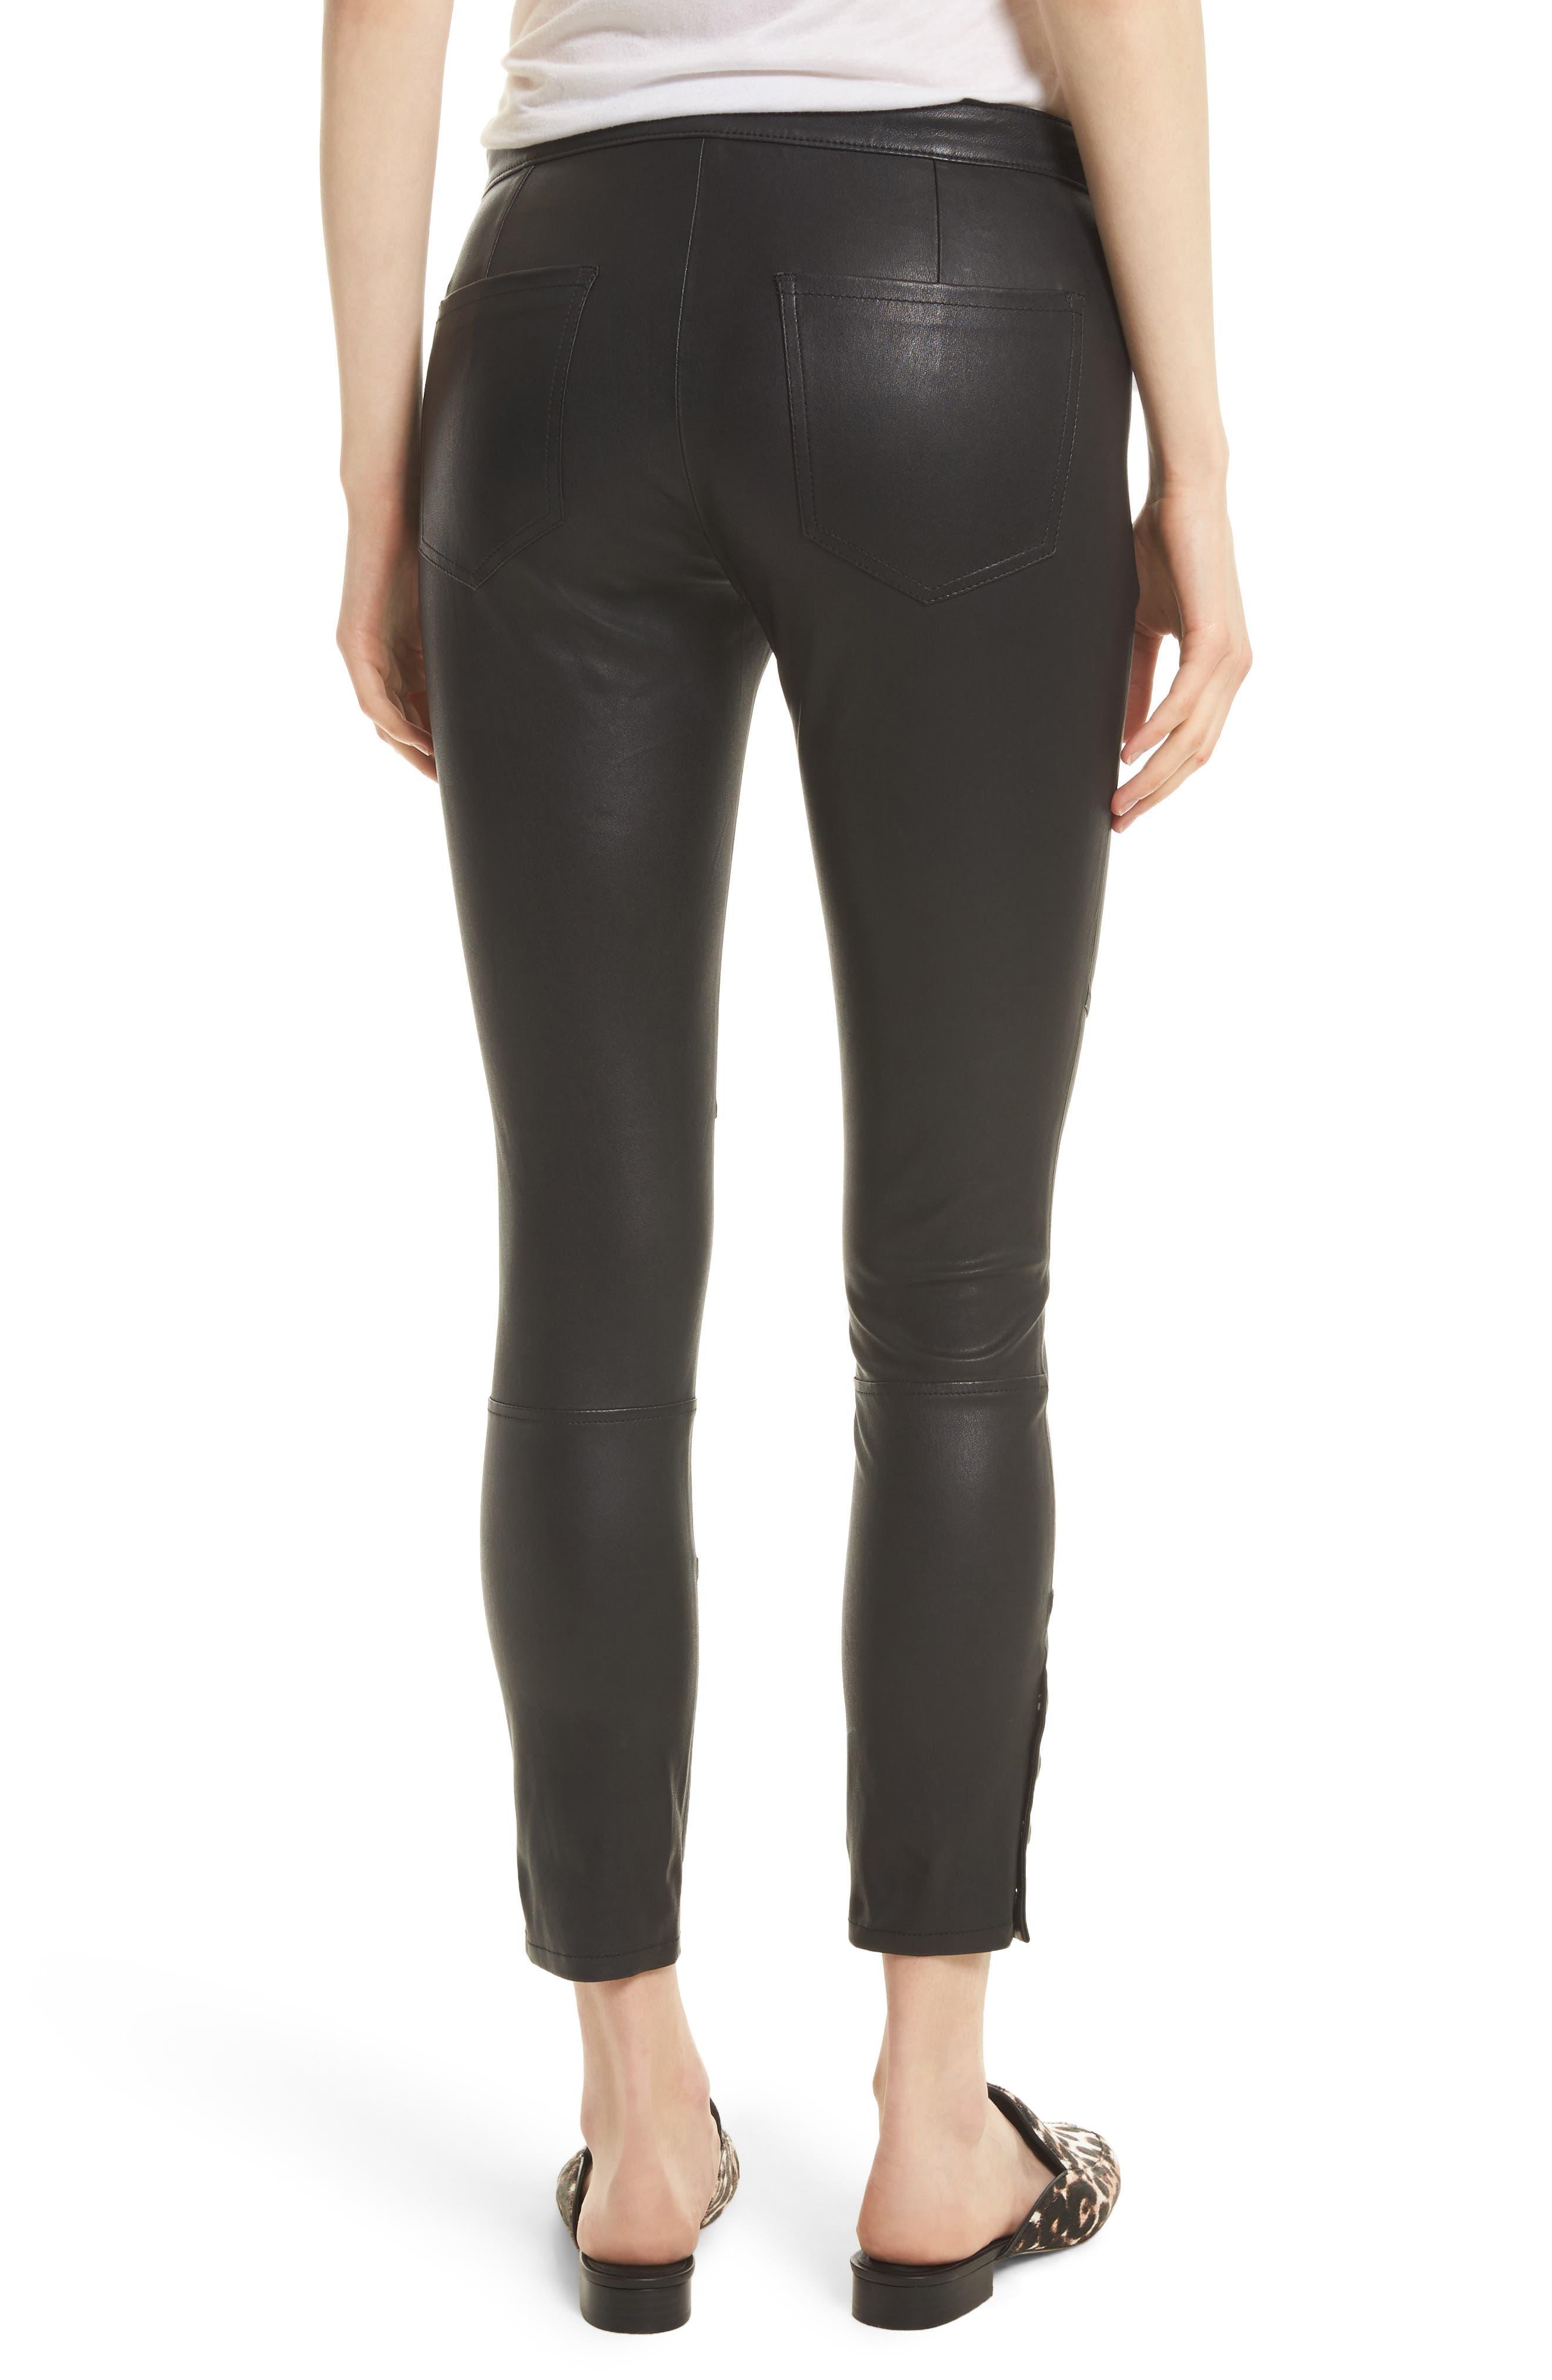 Darnella Leather Pants,                             Alternate thumbnail 2, color,                             002